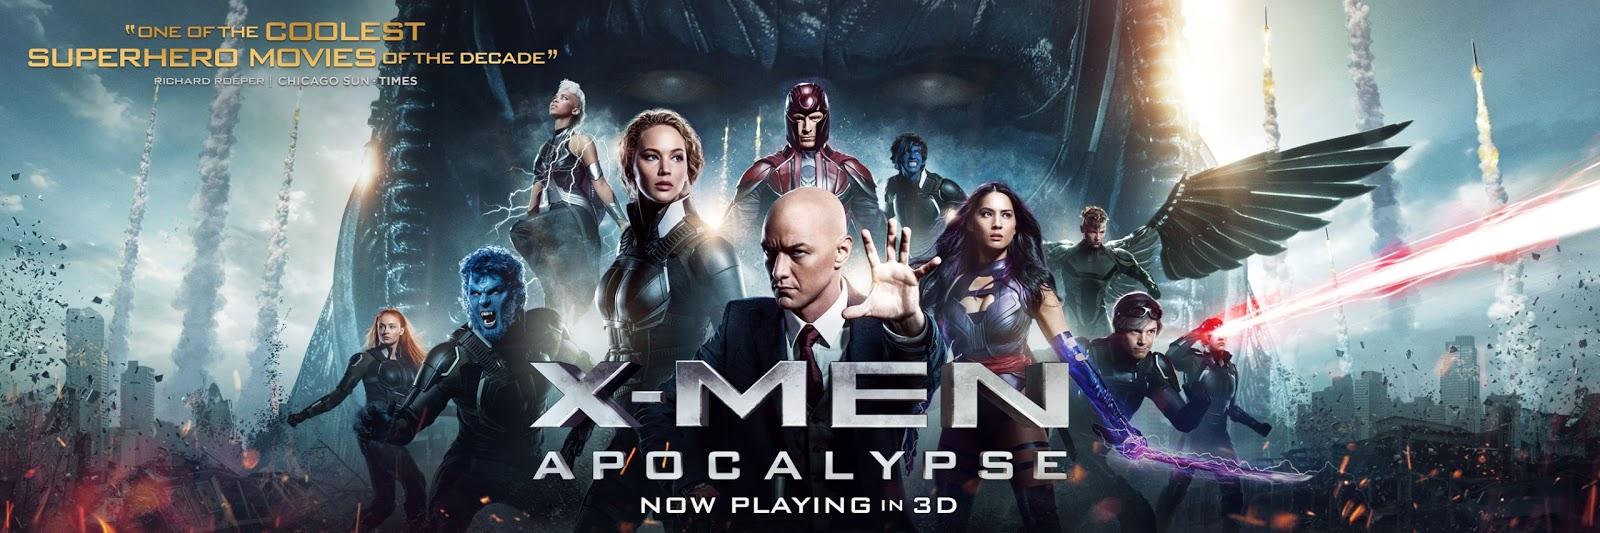 X Men Apocalypse Wallpaper